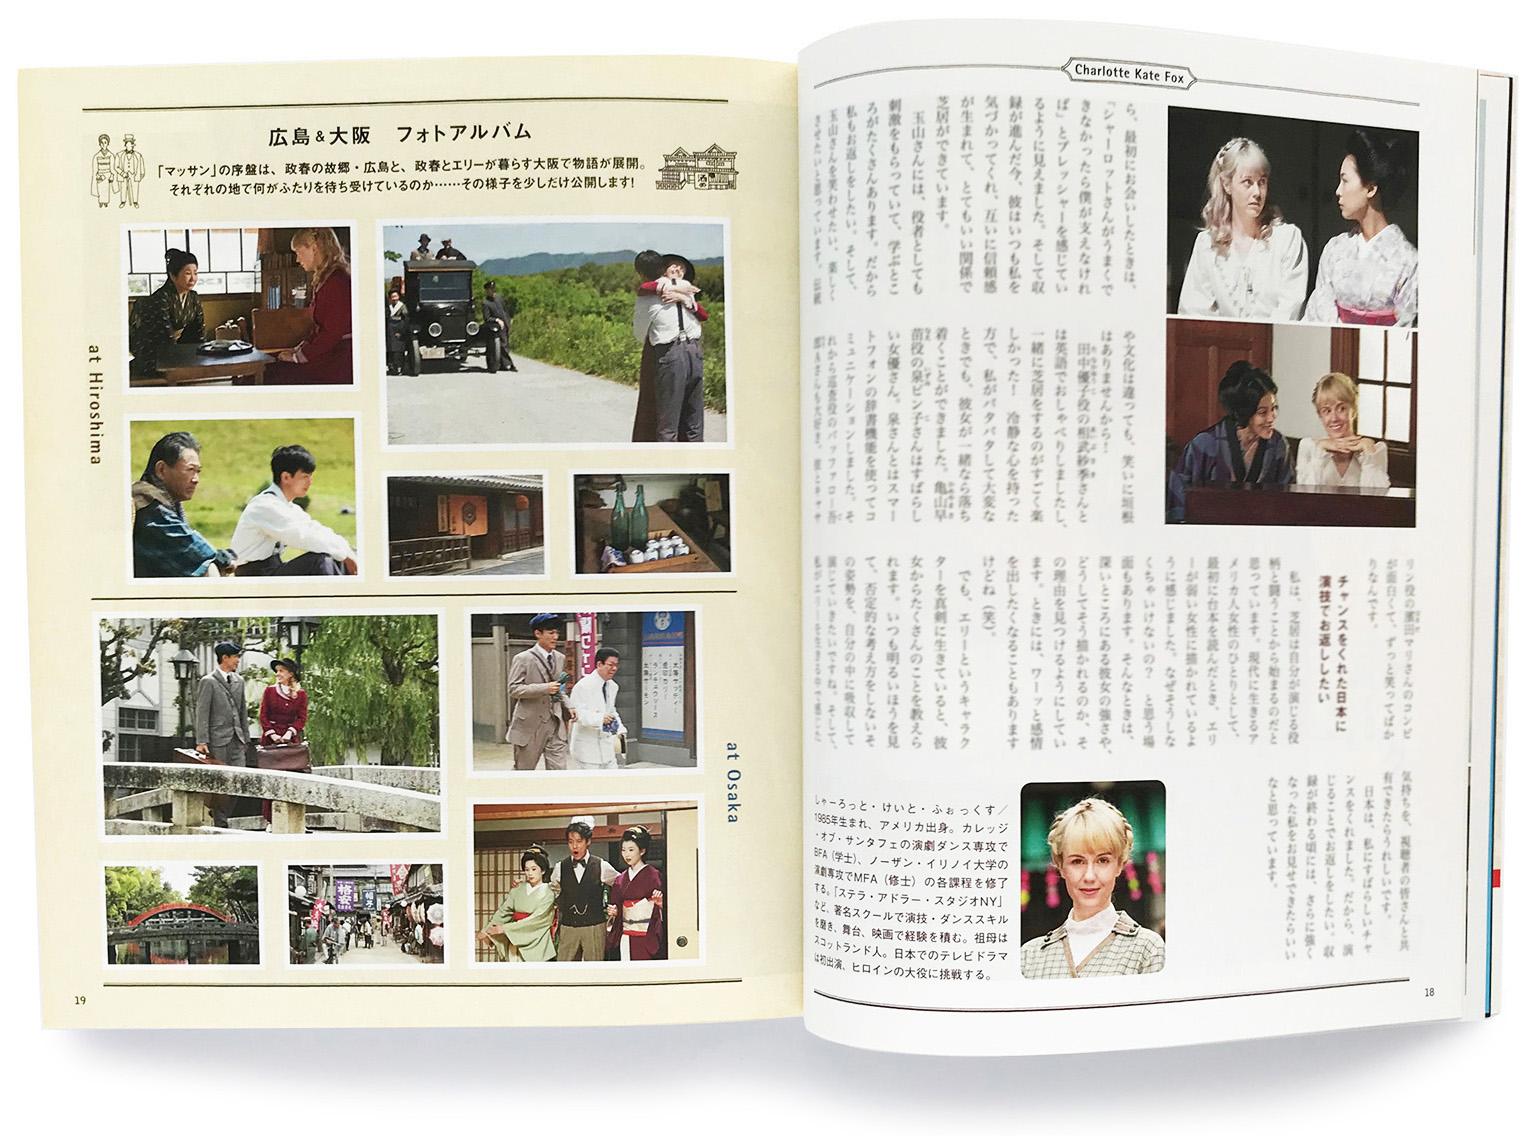 NHKドラマ・ガイド『連続テレビ小説 マッサン』